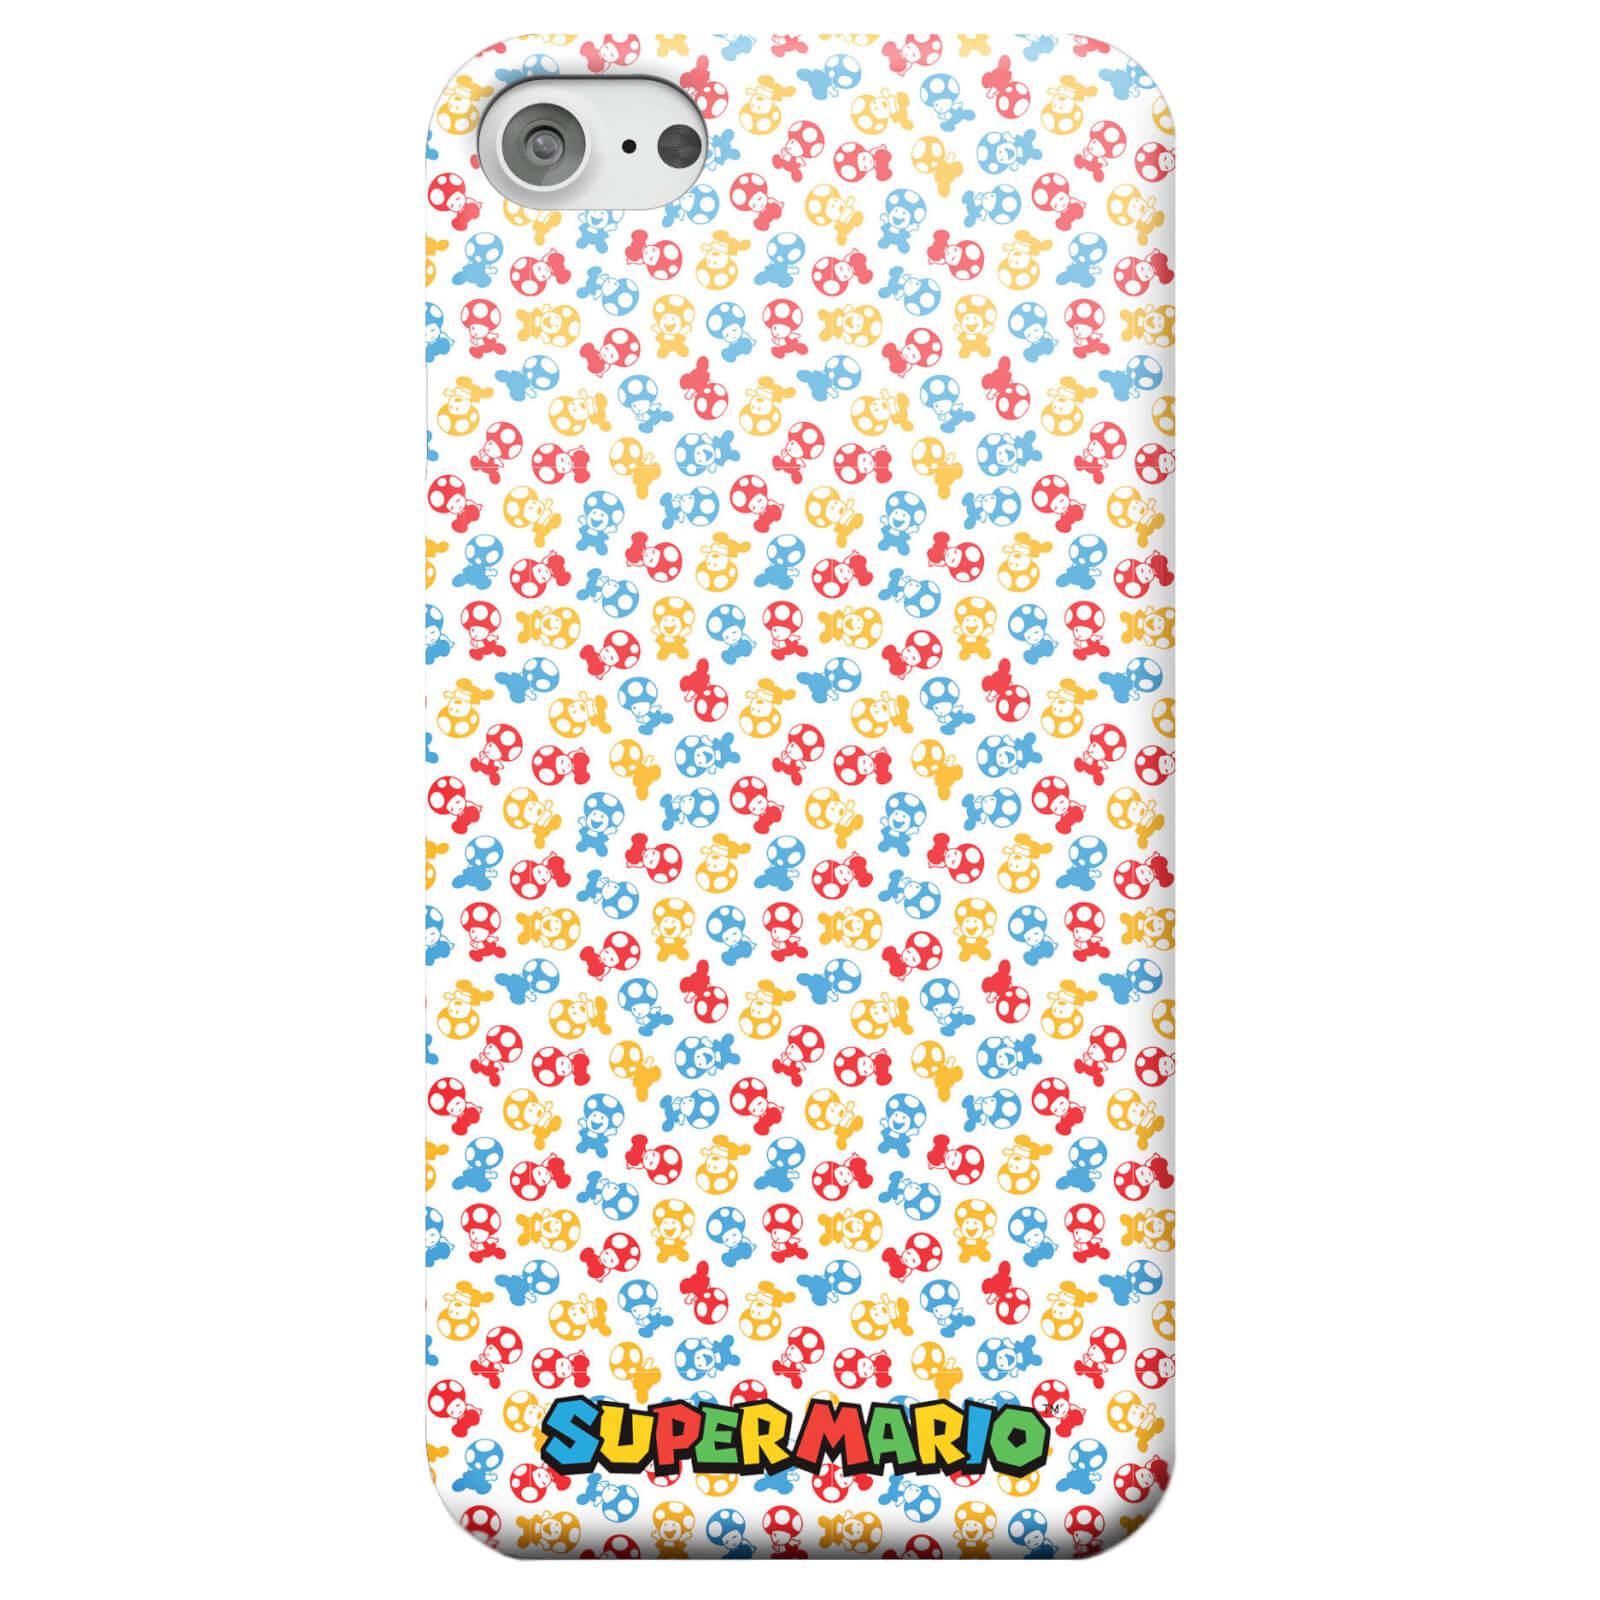 OfferteWeb.click 74-cover-telefono-nintendo-super-mario-toad-pattern-per-iphone